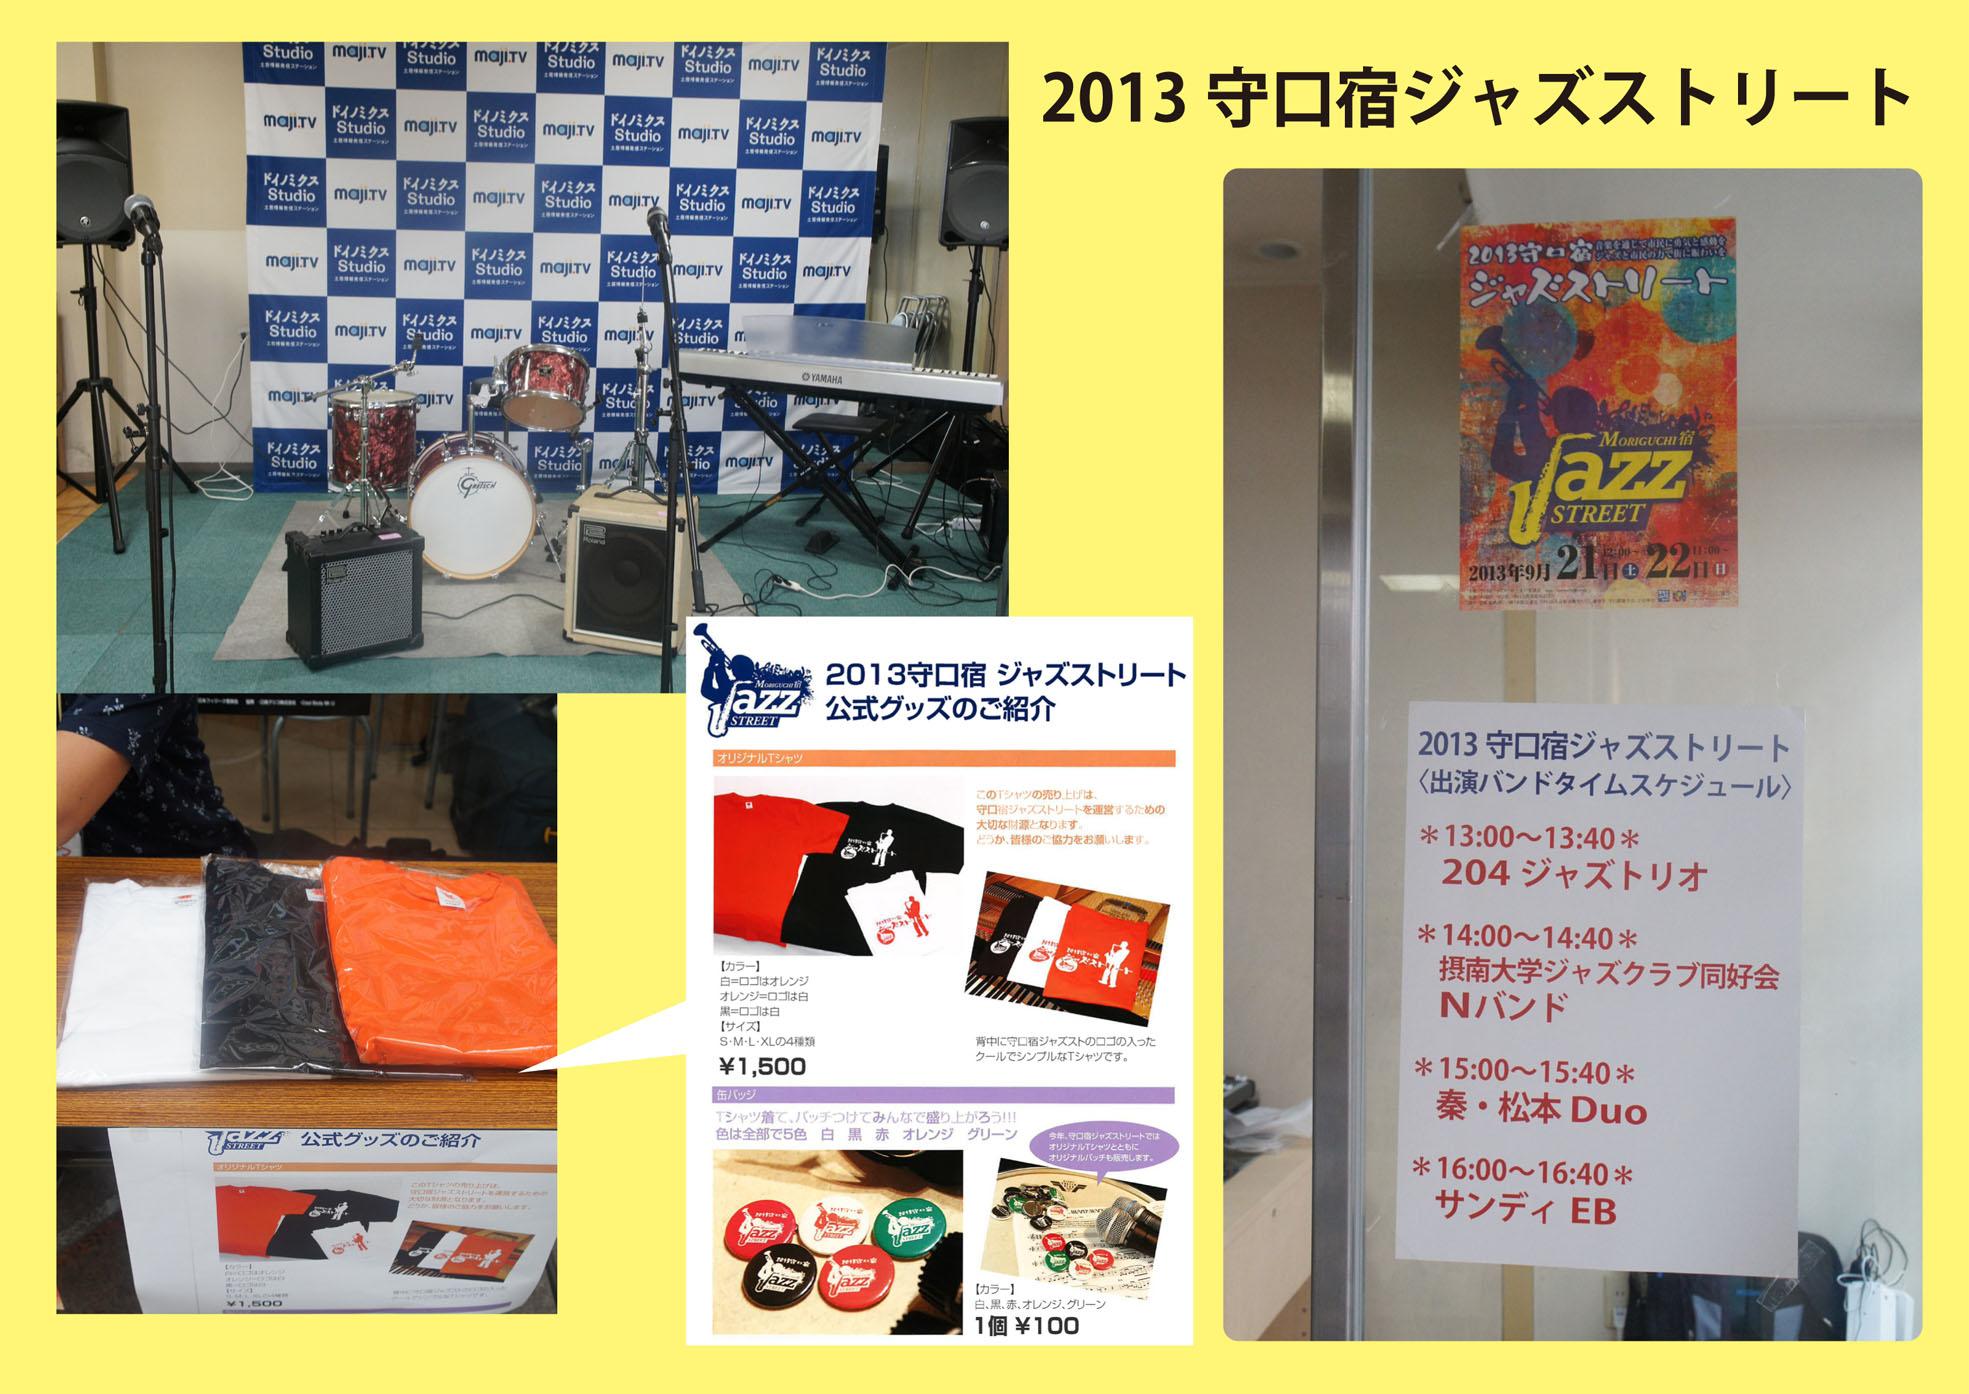 20130921124110d1c.jpg